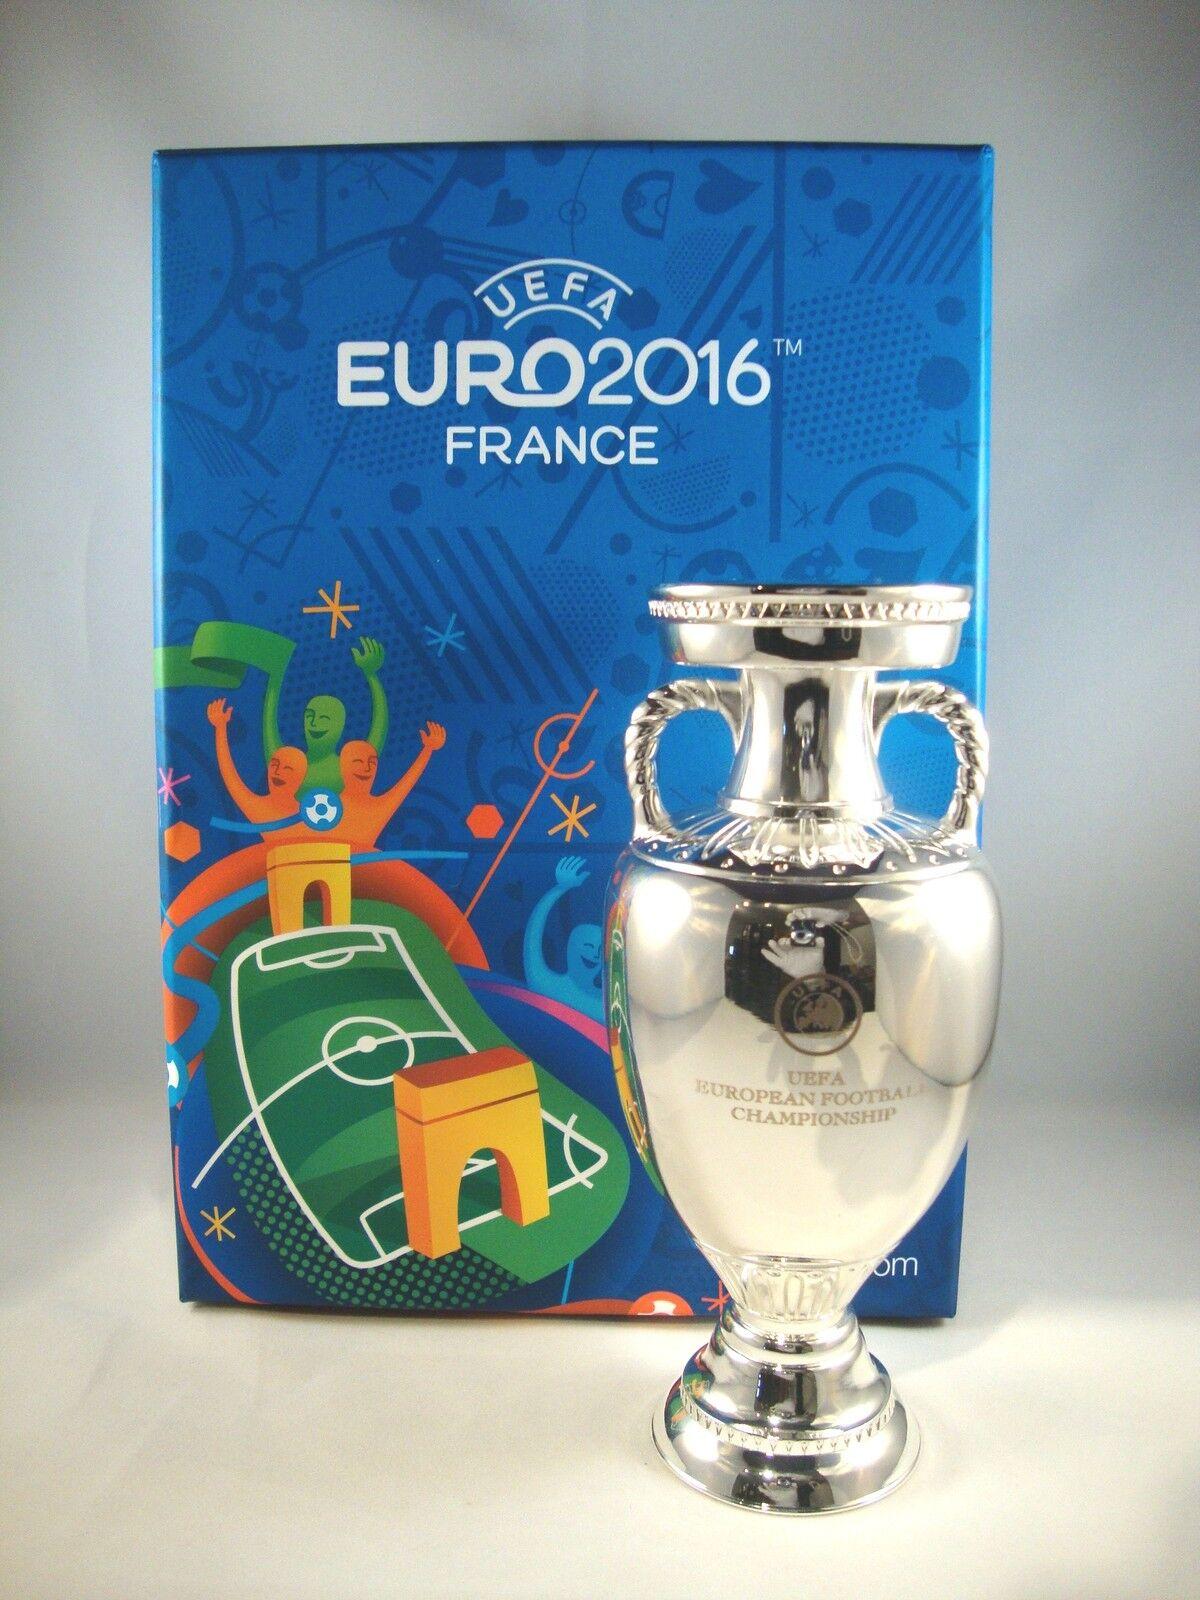 EM-Pokal EM-Pokal EM-Pokal 150mm freistehend UEFA Euro 2016 tm Cup France Vencedor Portugal troféu 2d76b1